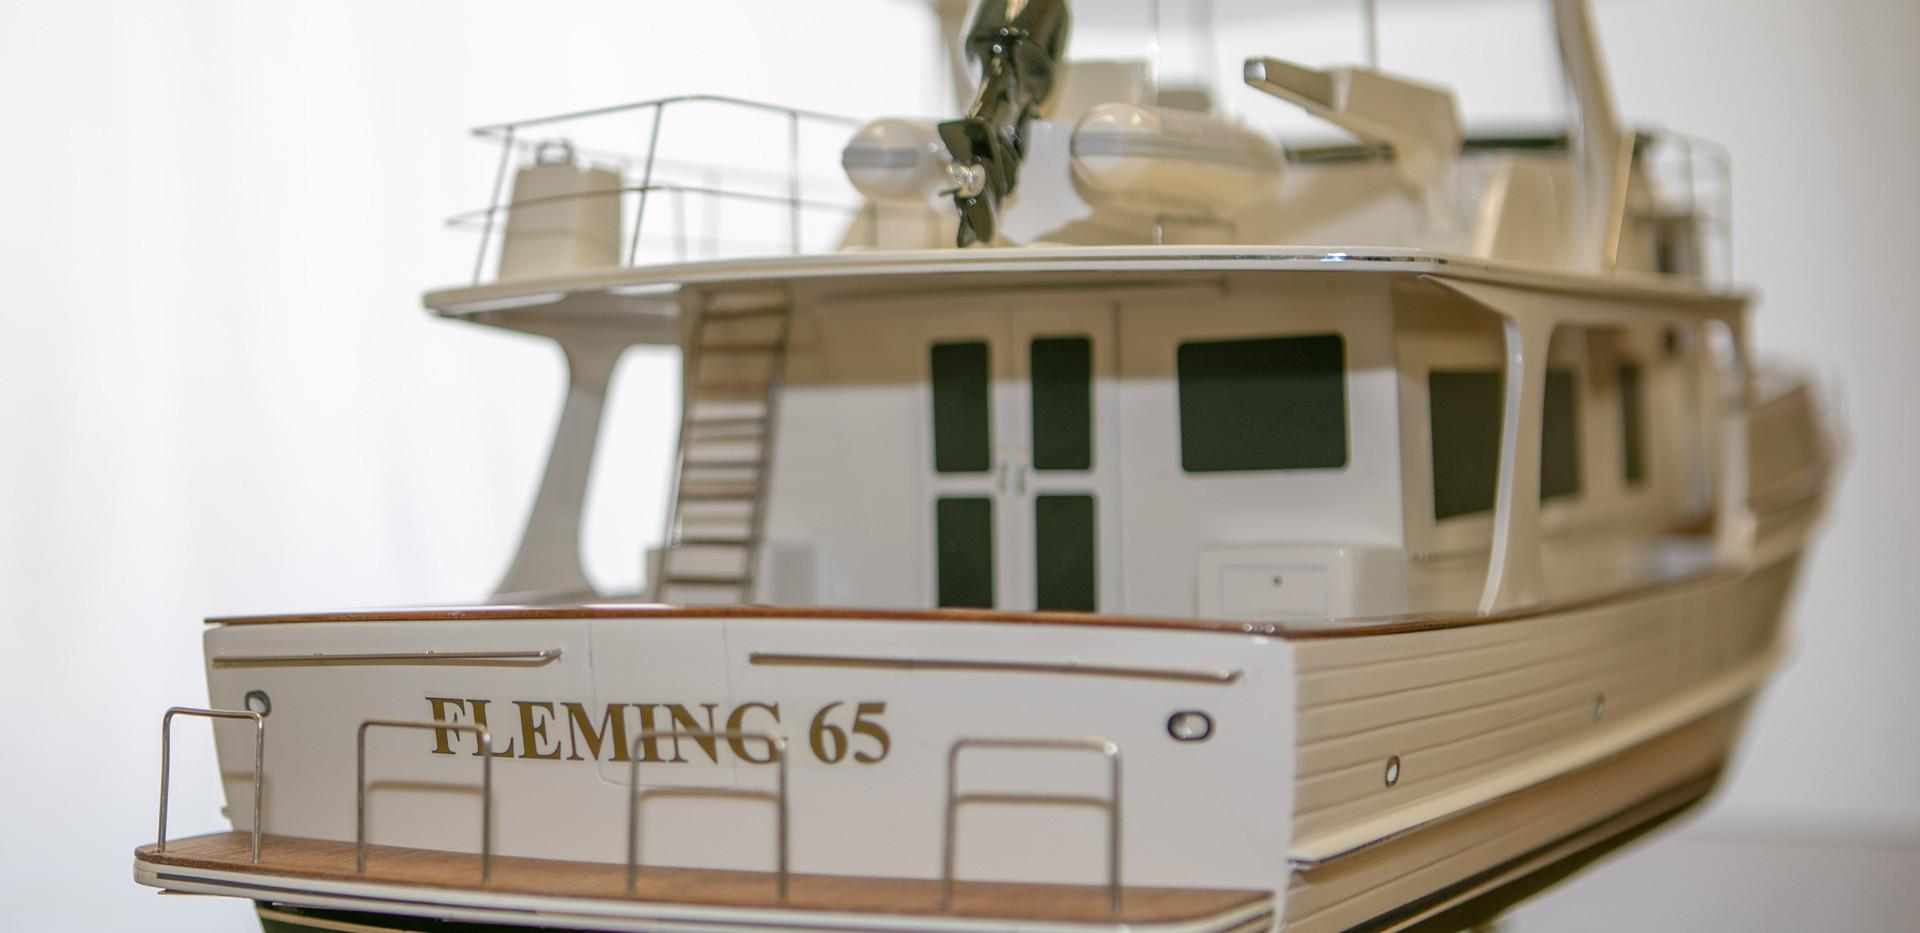 NewportBoatModels-Fleming65Full-4.jpg